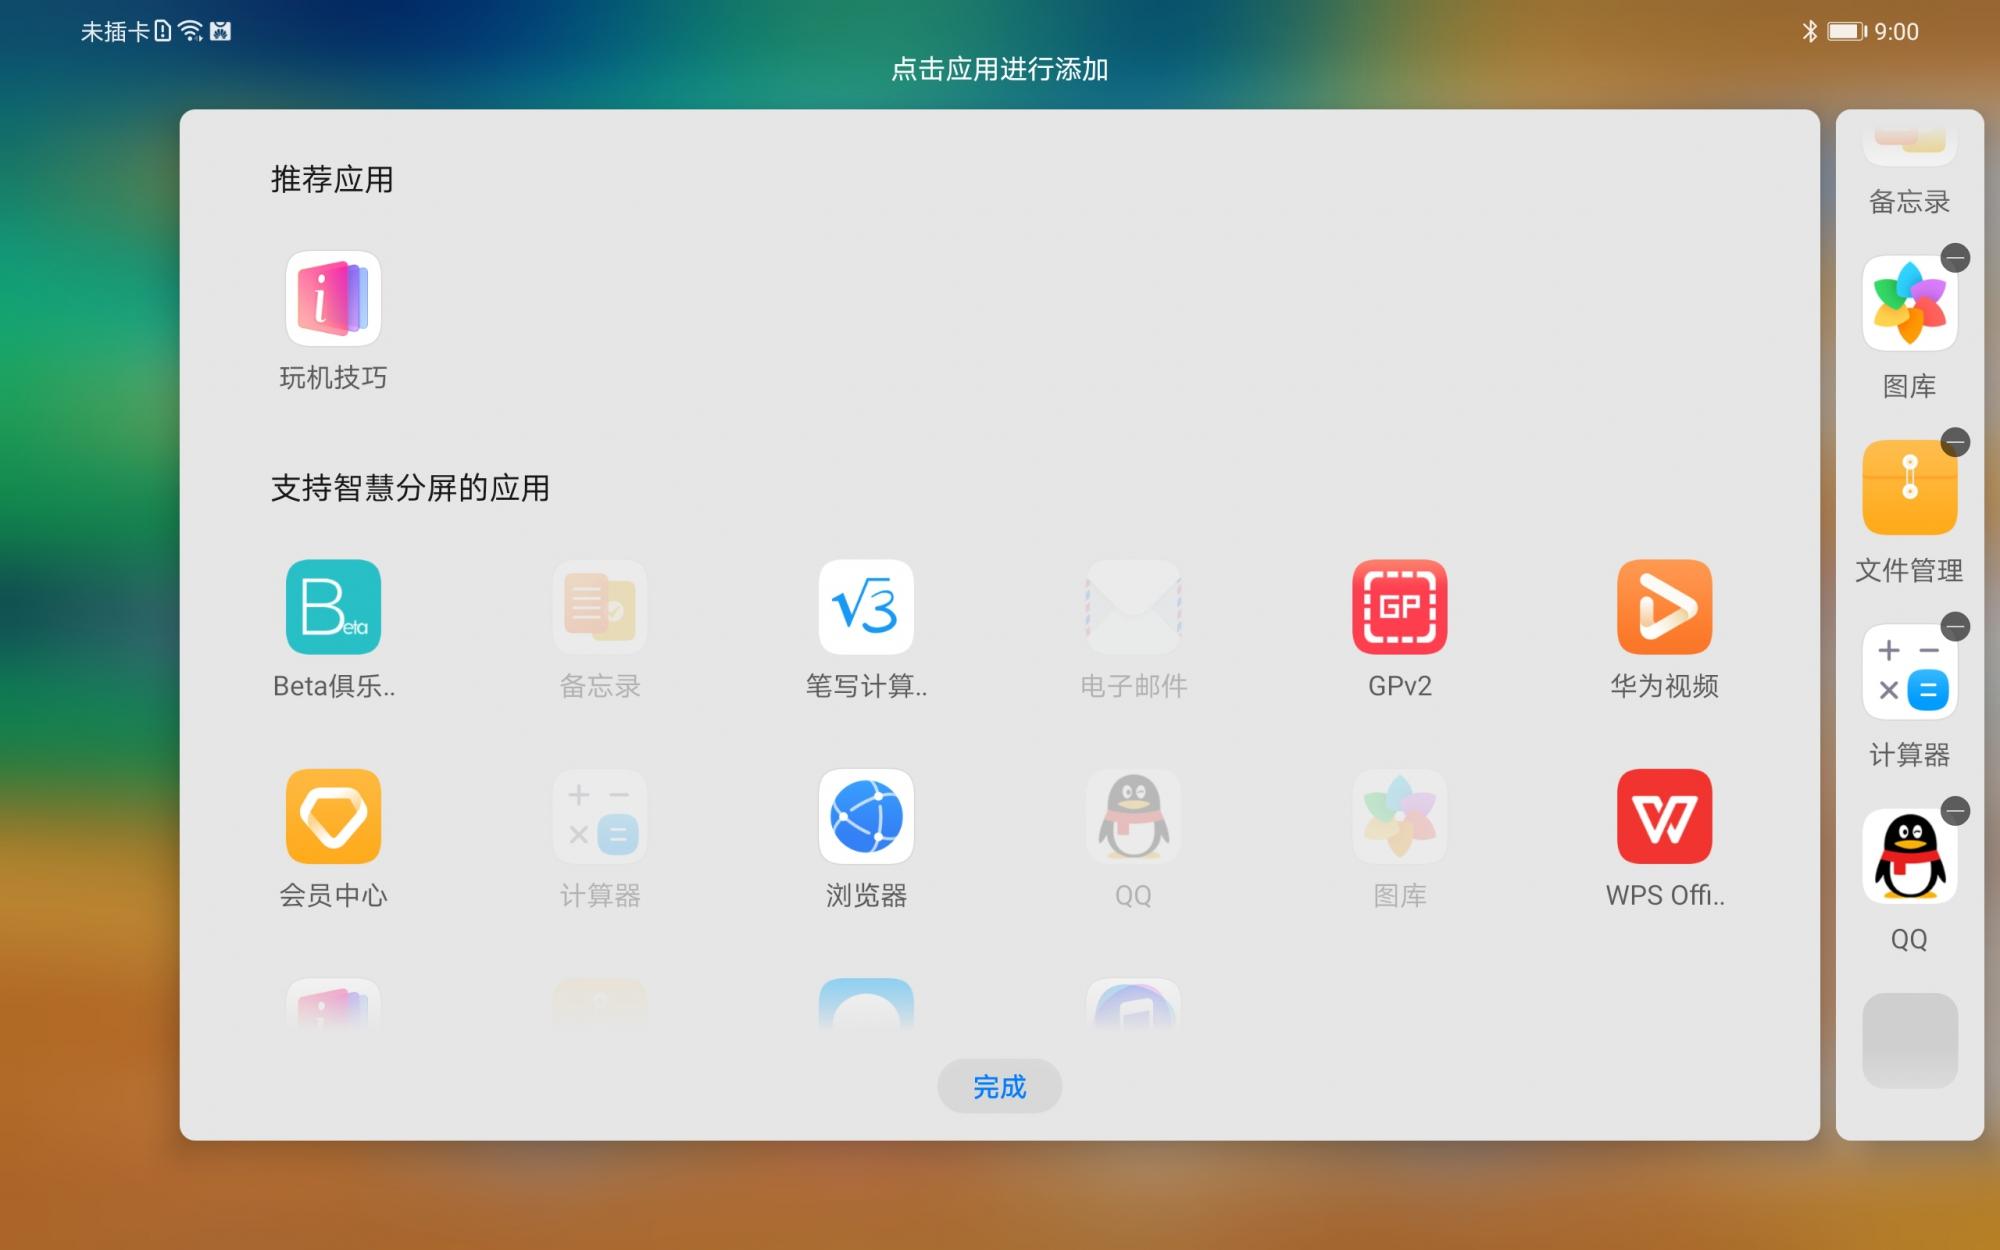 Screenshot_20200112_210012_com.huawei.android.lau.jpg